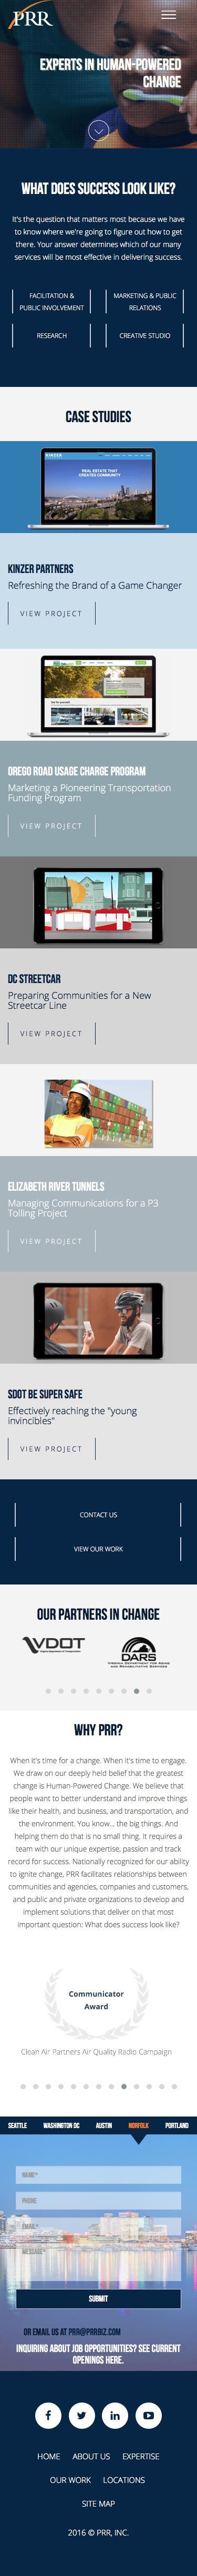 Screenshot of prrbiz.com - PRR | Communications, Marketing, Research, & Digital - captured Oct. 11, 2016